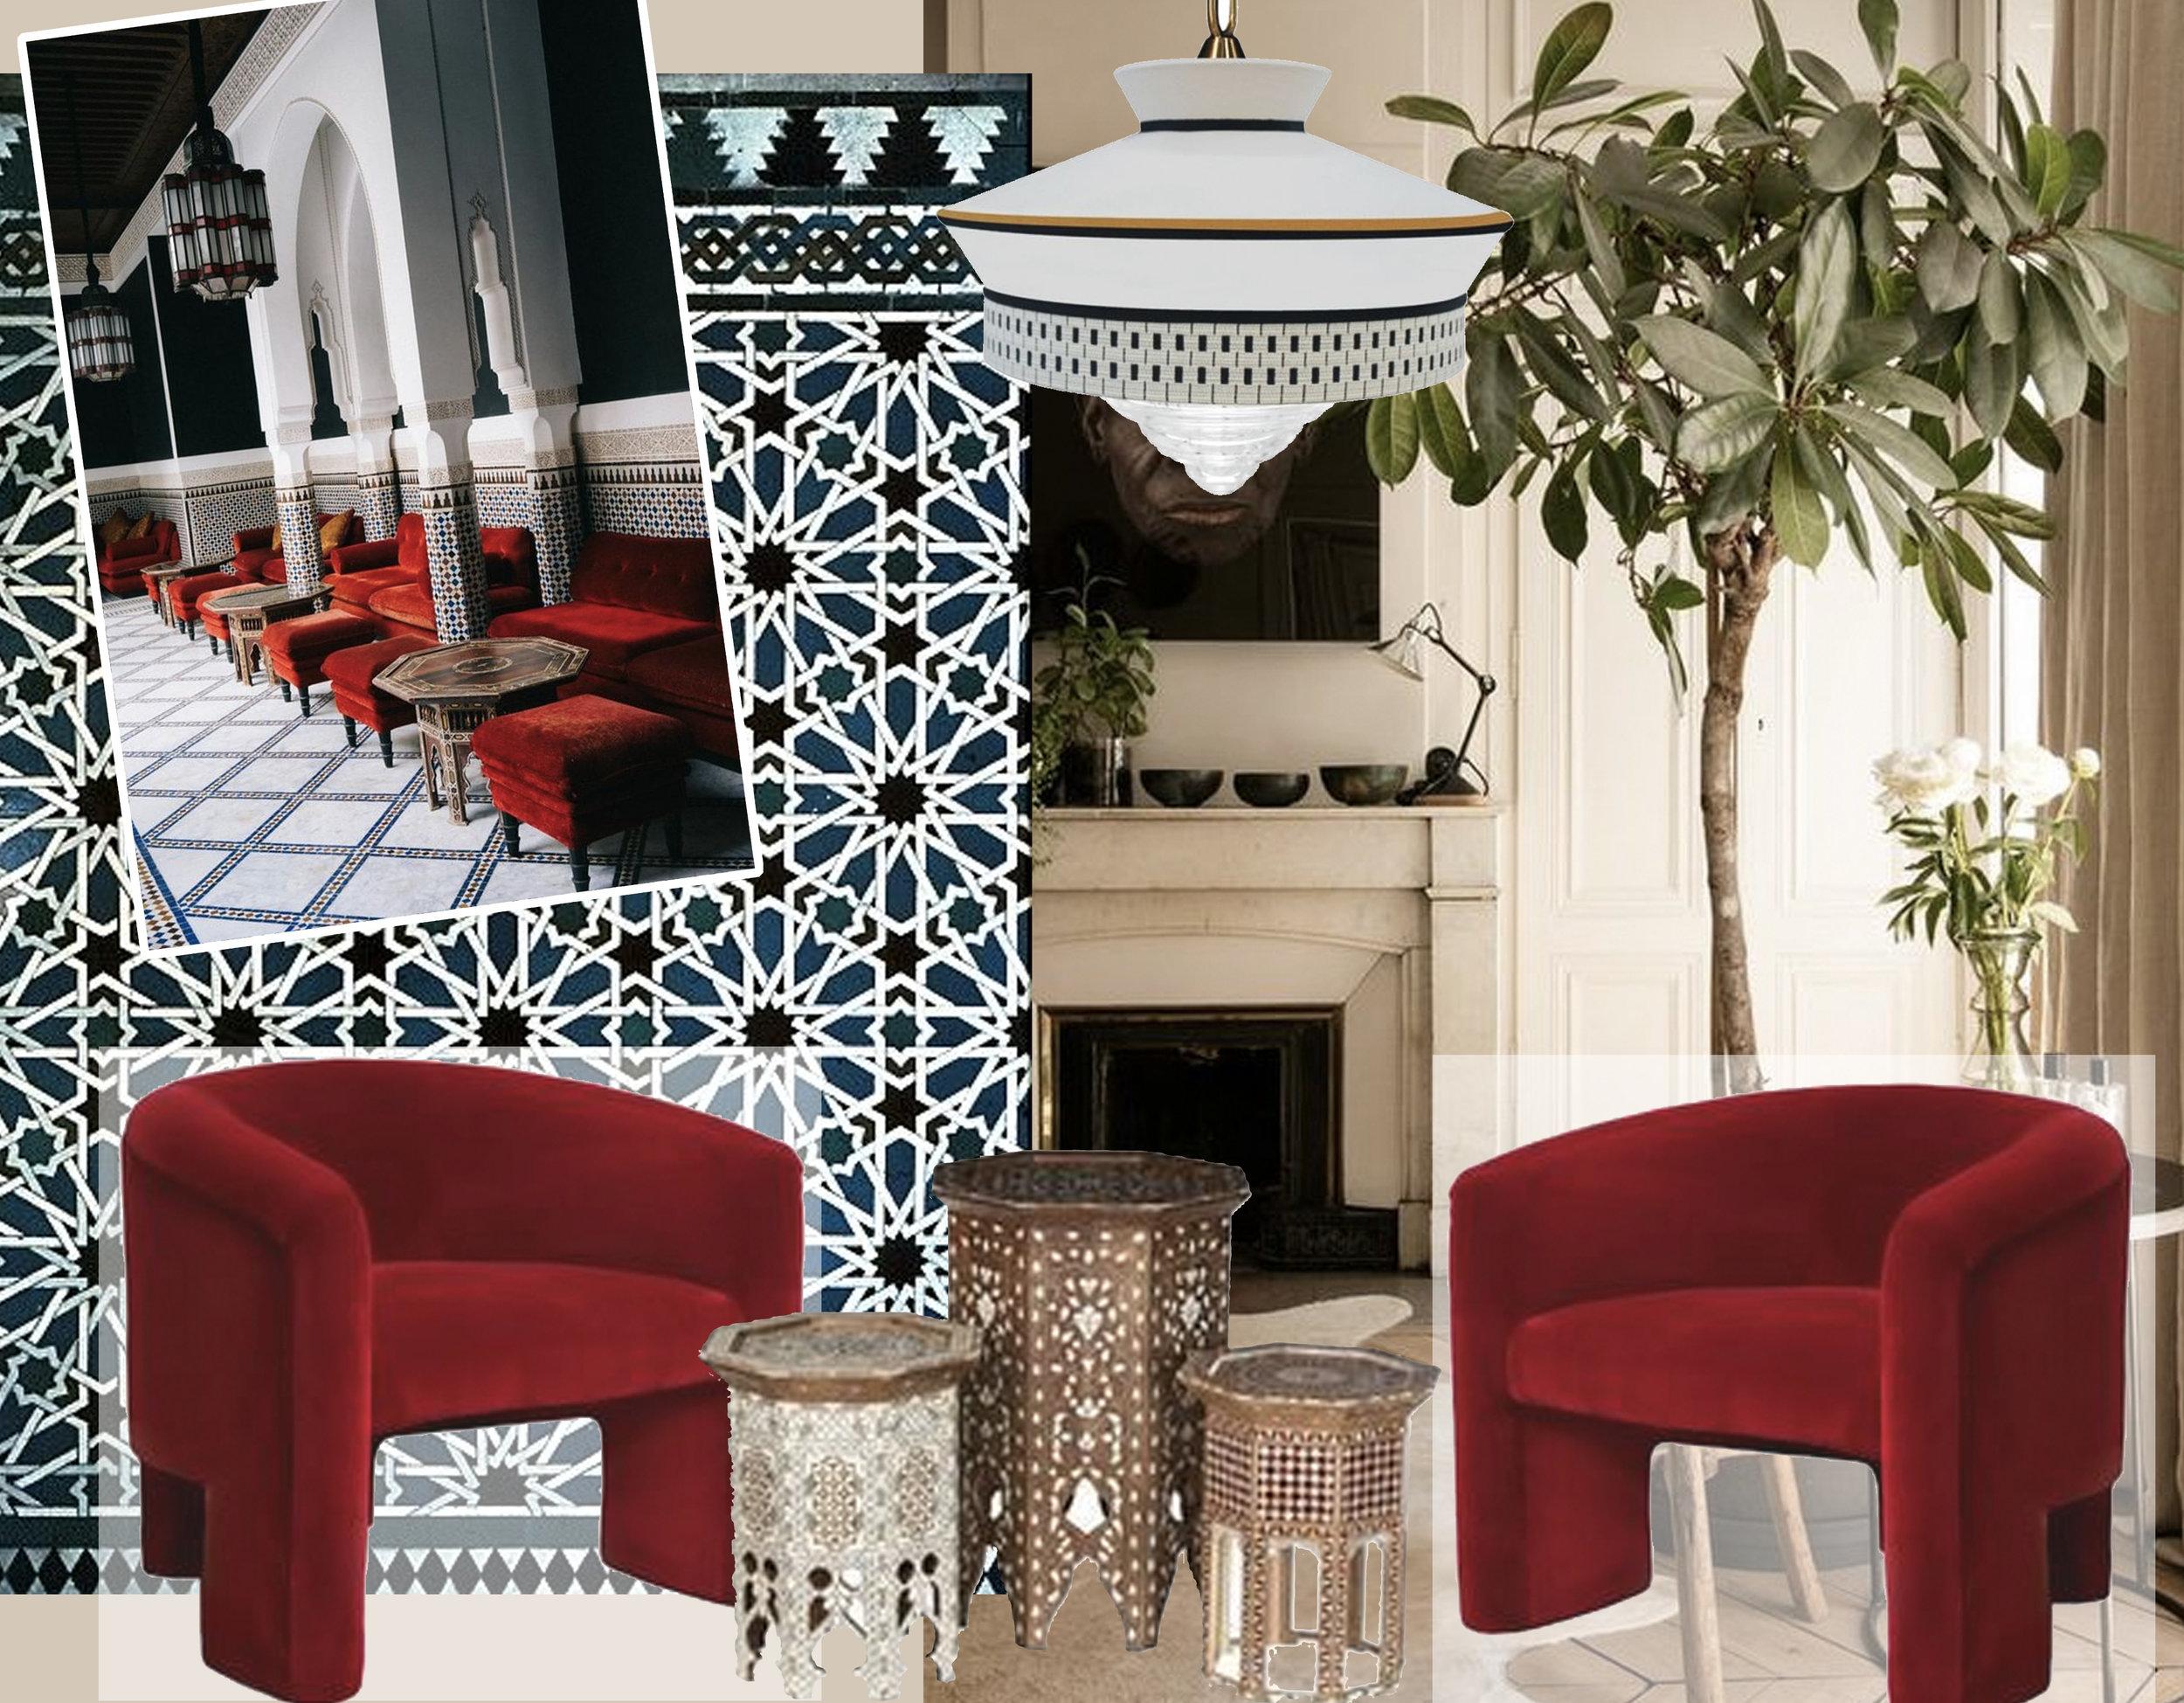 La Mamounia via  Bon Traveler  - geometric pattern via  Pattern in Islamic Art -  interior image via  Living room Ideas  - lounge chairs via  Decaso  - Morroccan tables via  Home Ideas  - Calypso Martinique Pendarti pendant lamp via  Milia Shop